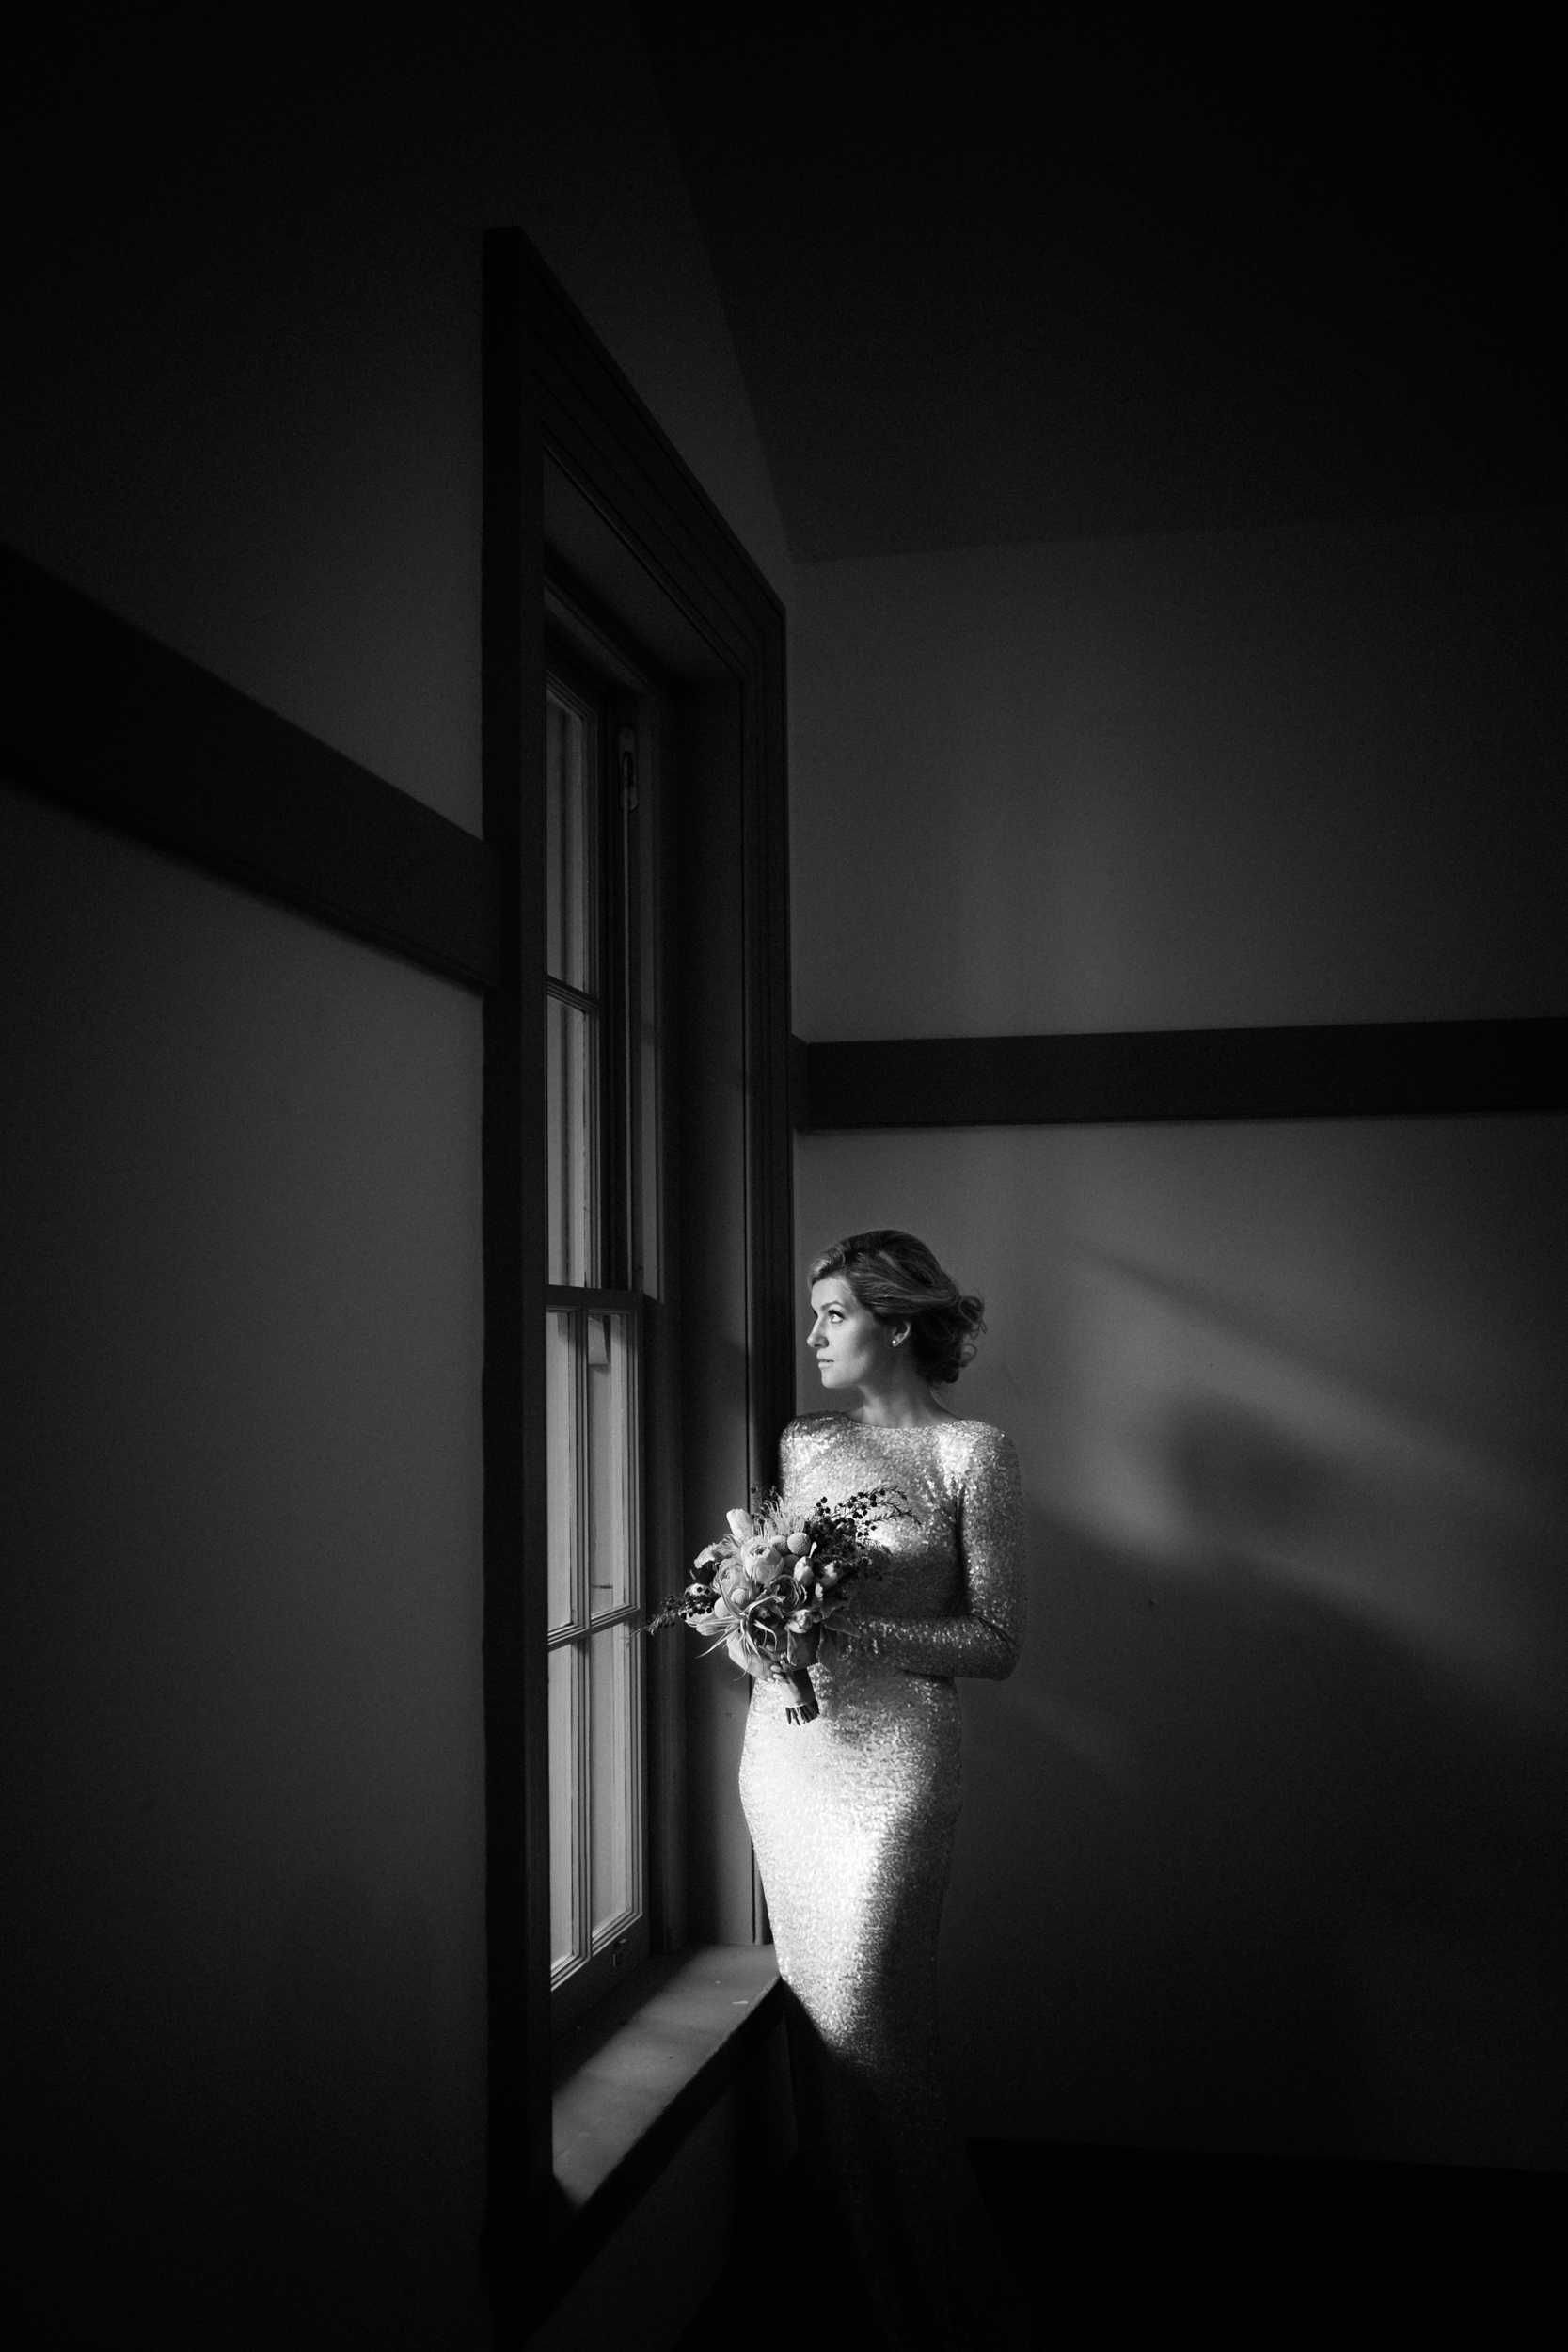 Fort_Point_Couple_photoshoot-Wedding-AlexLopezPhotography-2.jpg